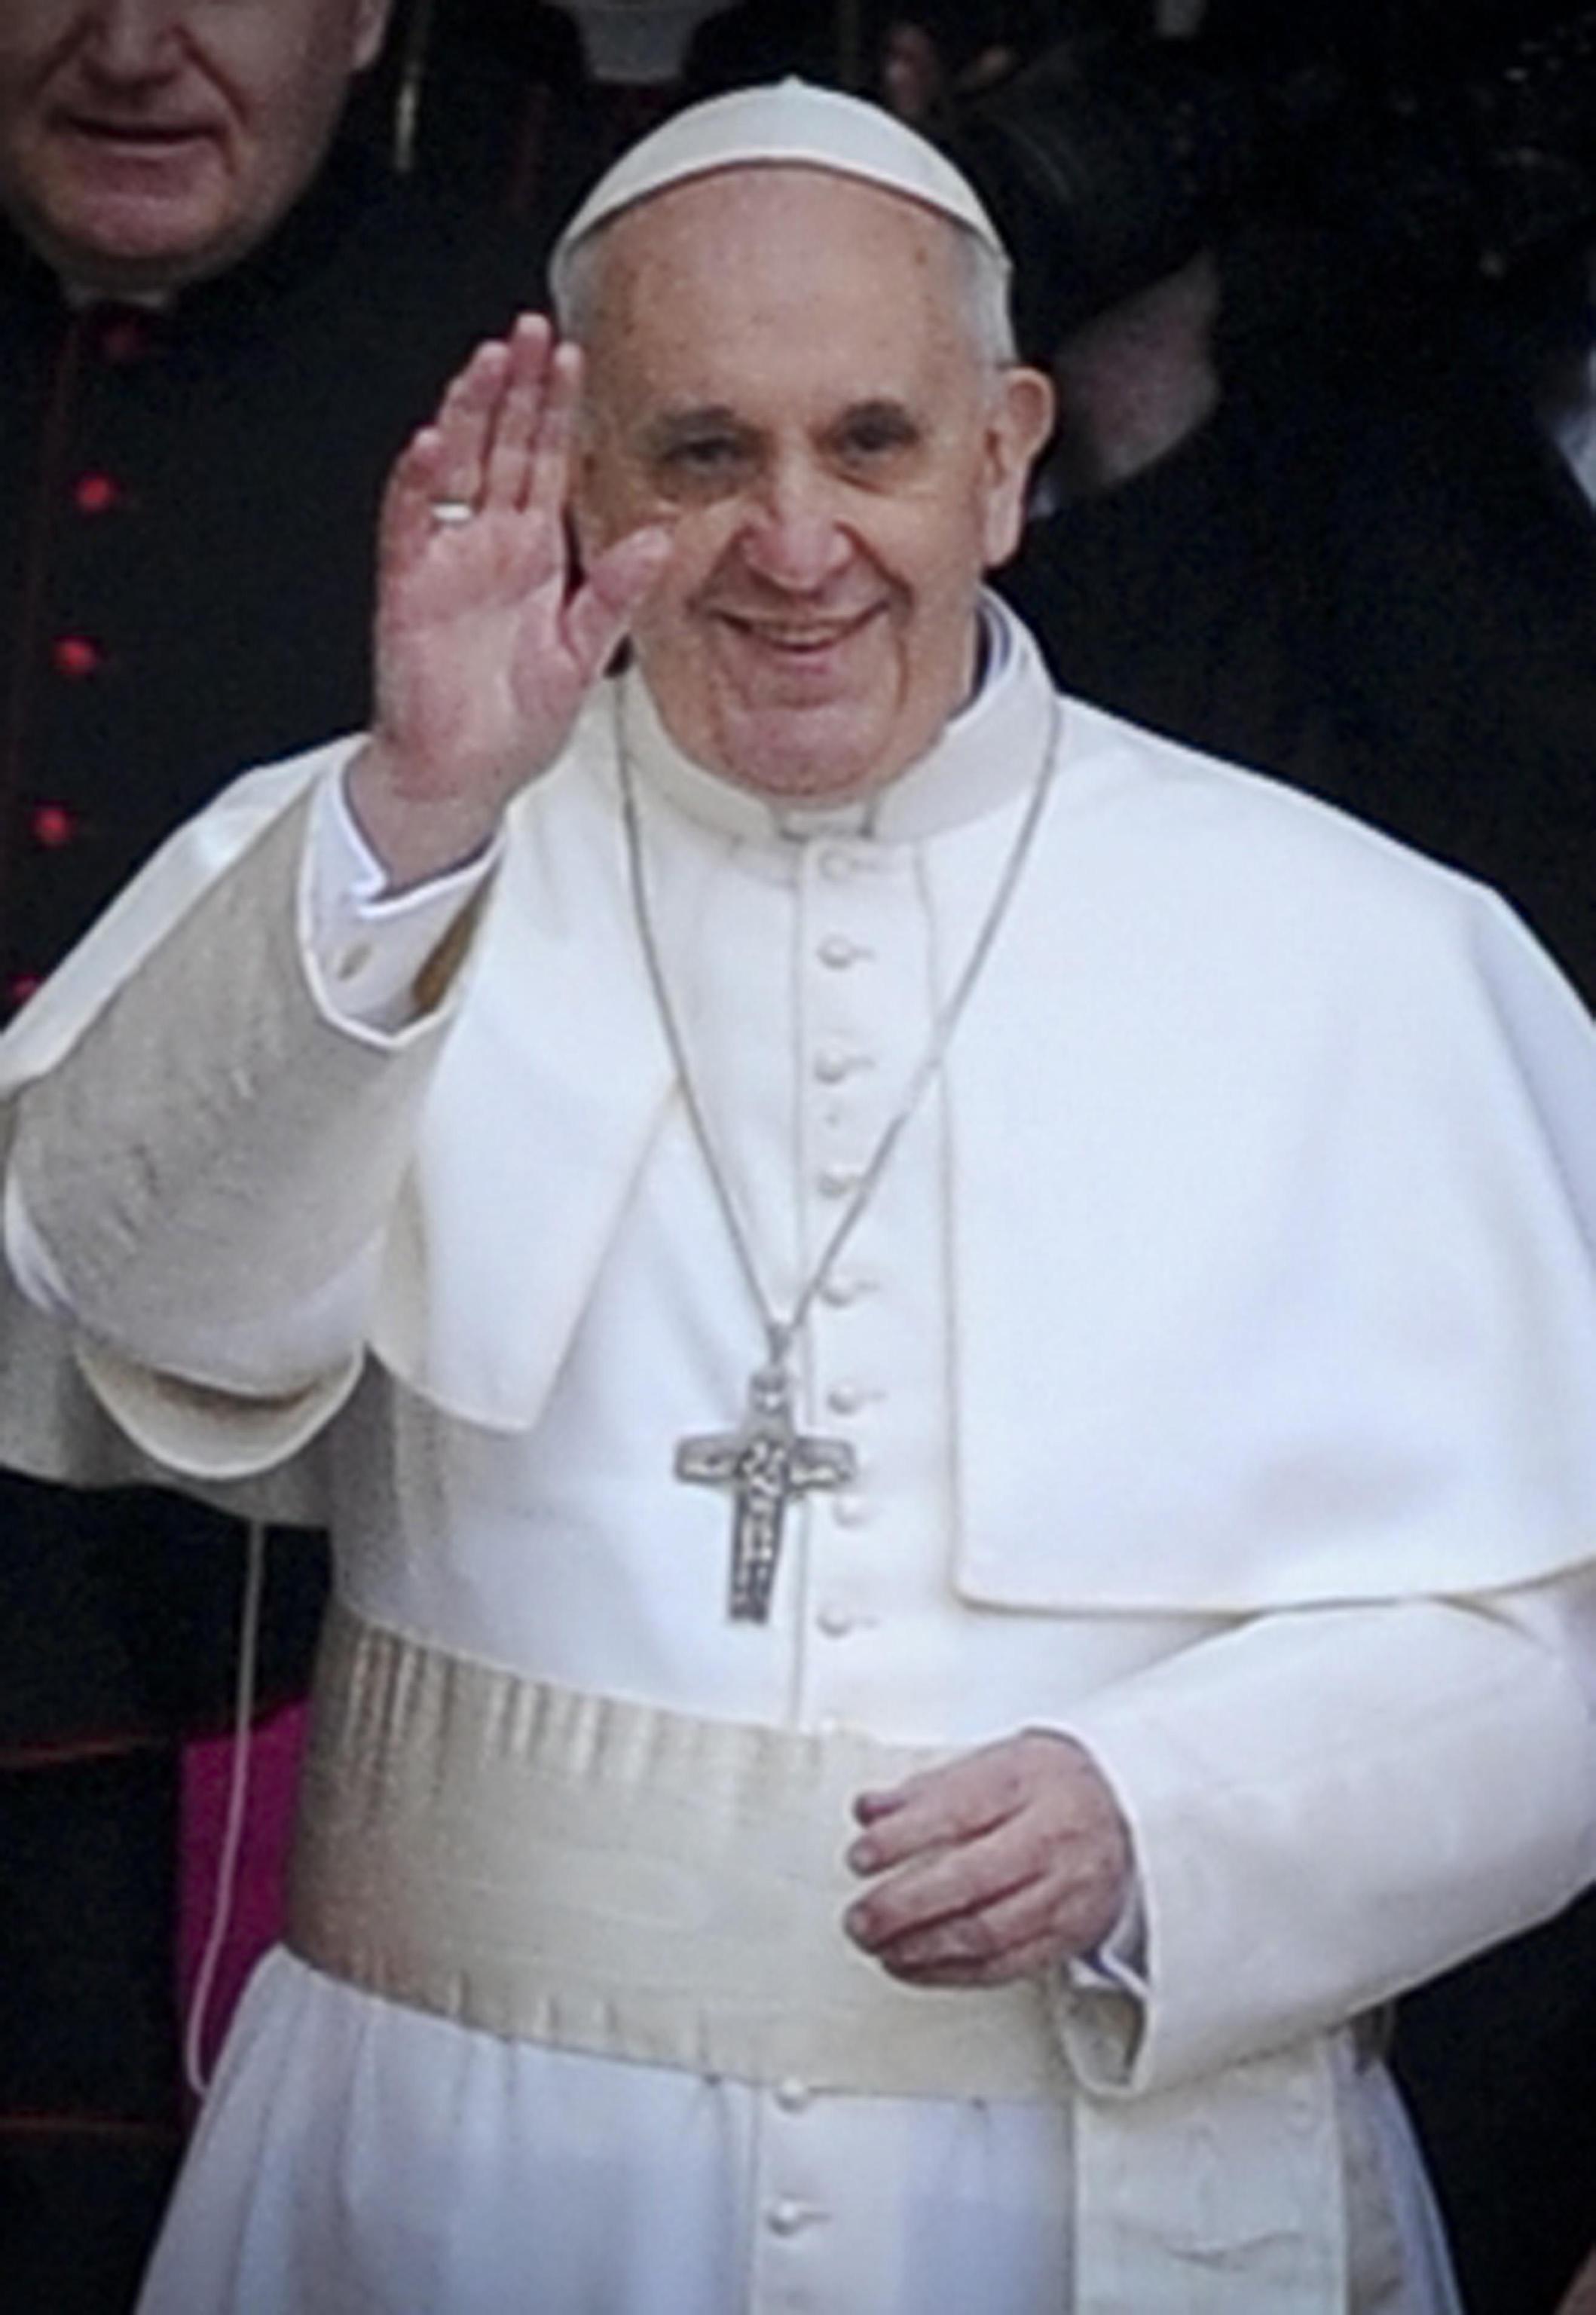 santi legati al giubileo 2015